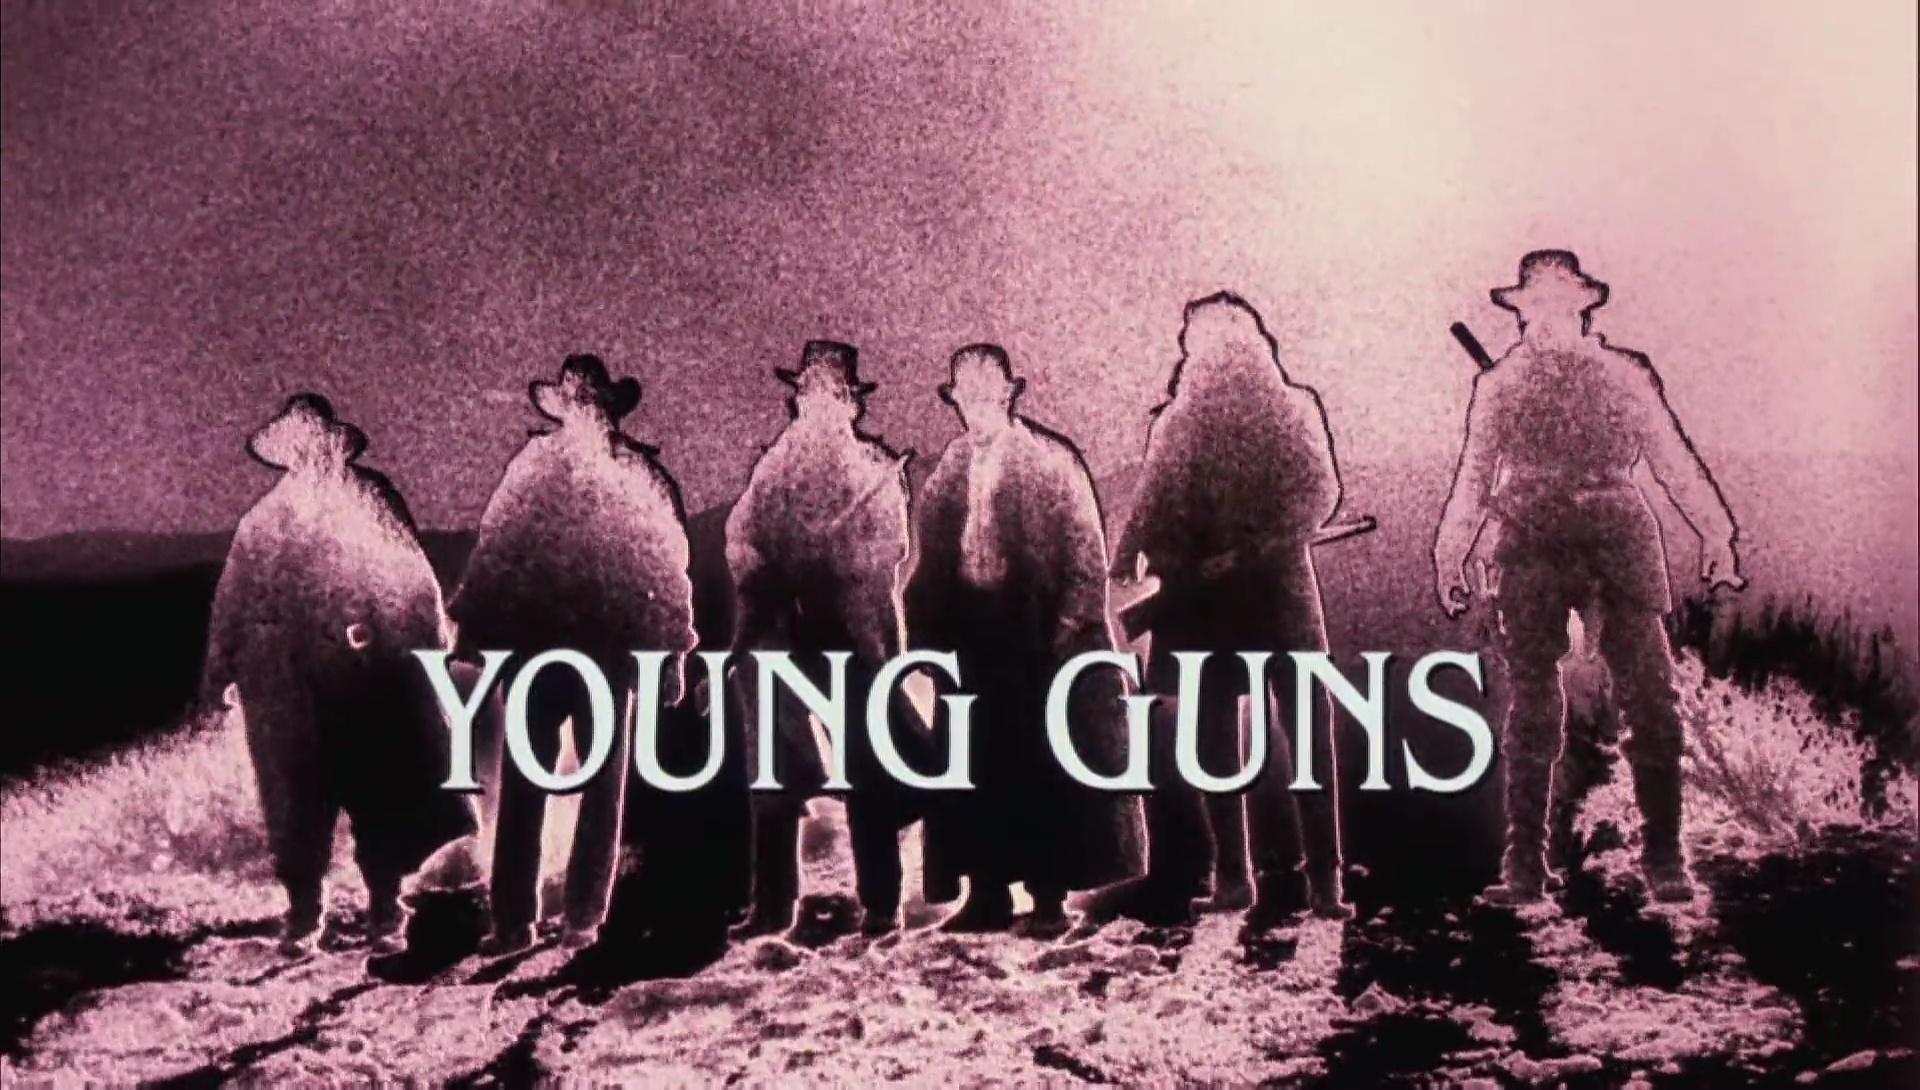 YOUNG GUNS de Christopher Cain (1988)